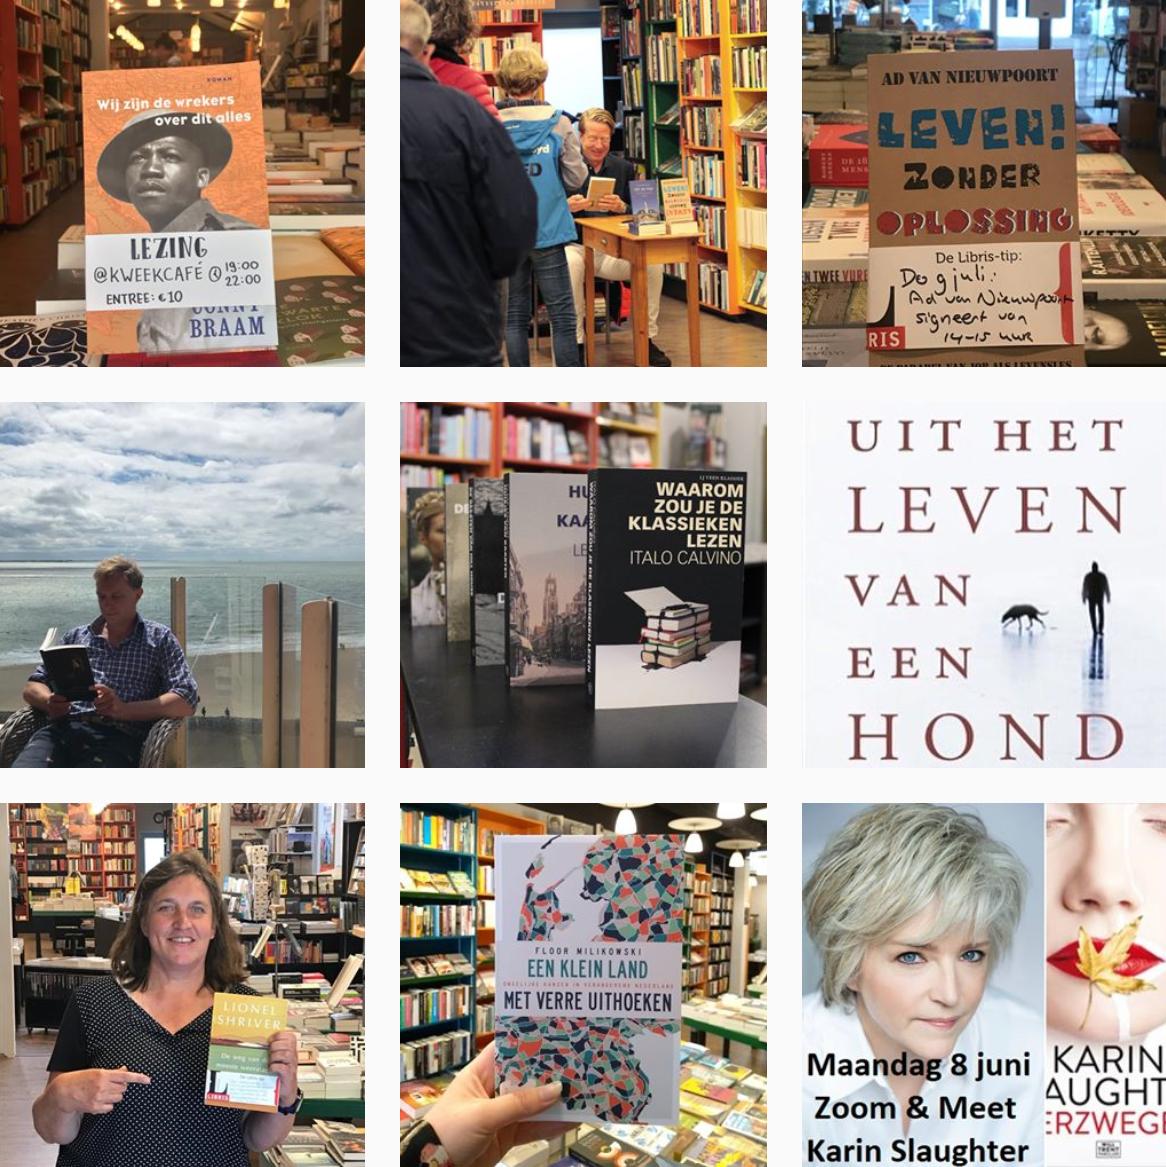 http://www.kennemerboekhandel.nl